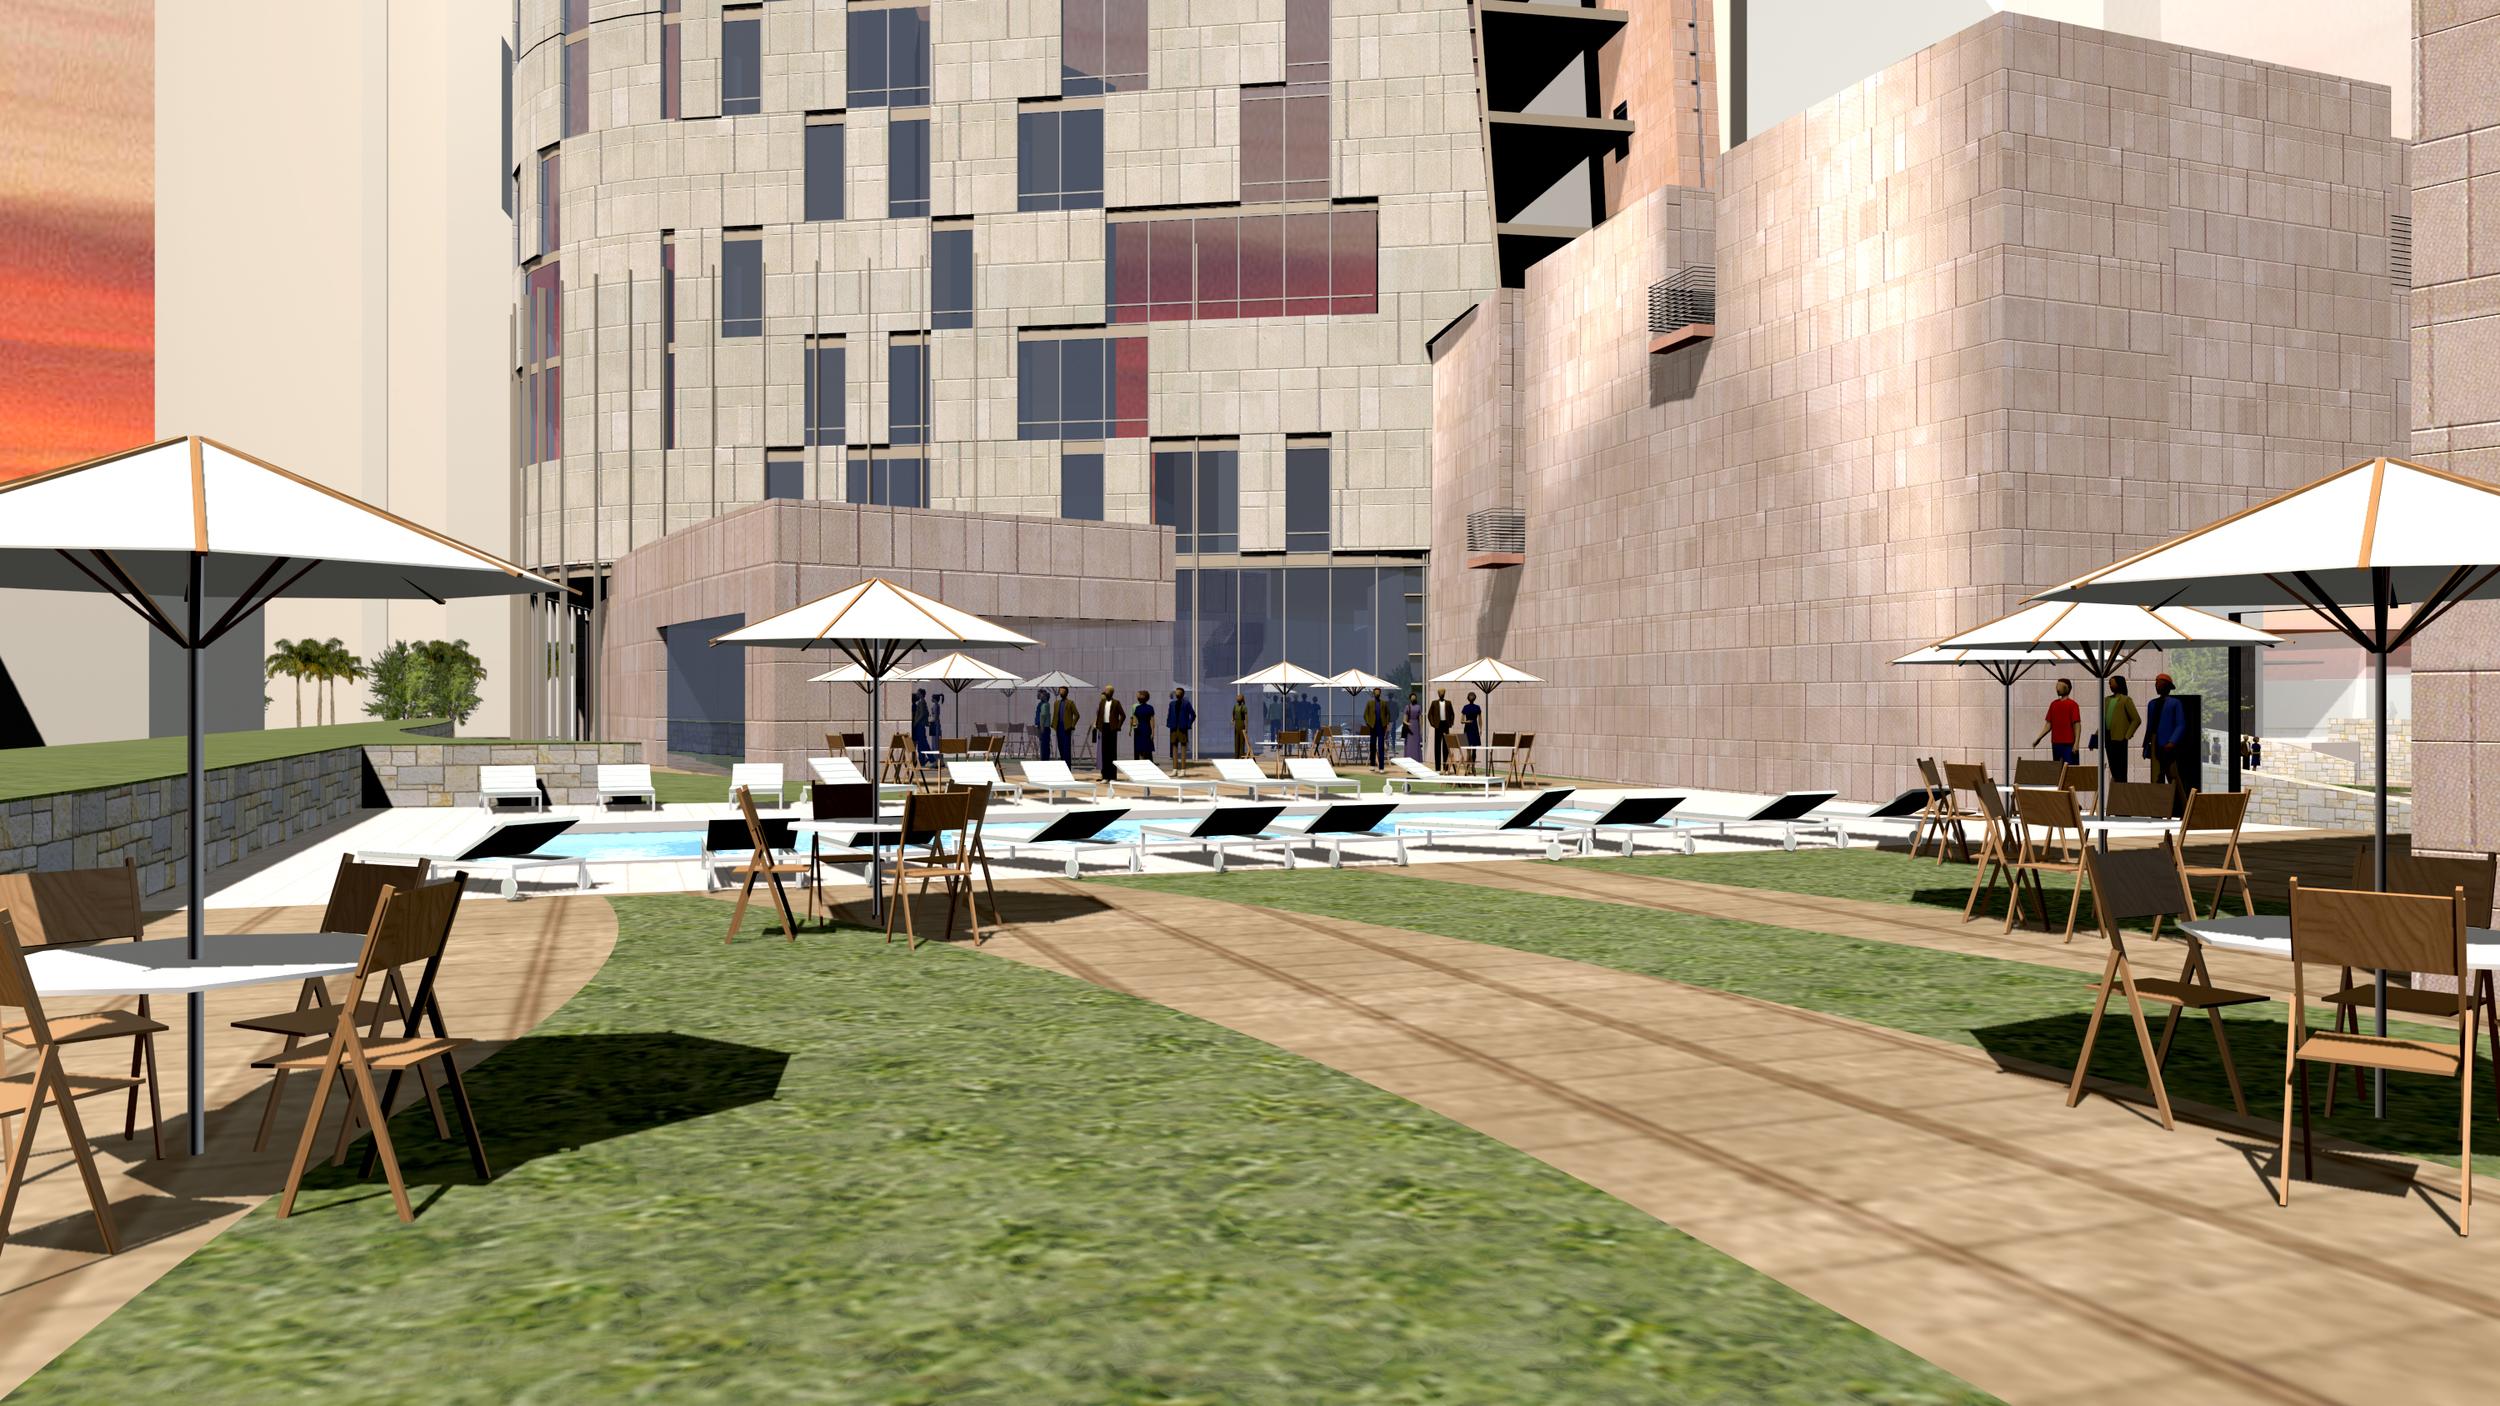 amenities_deck.jpg